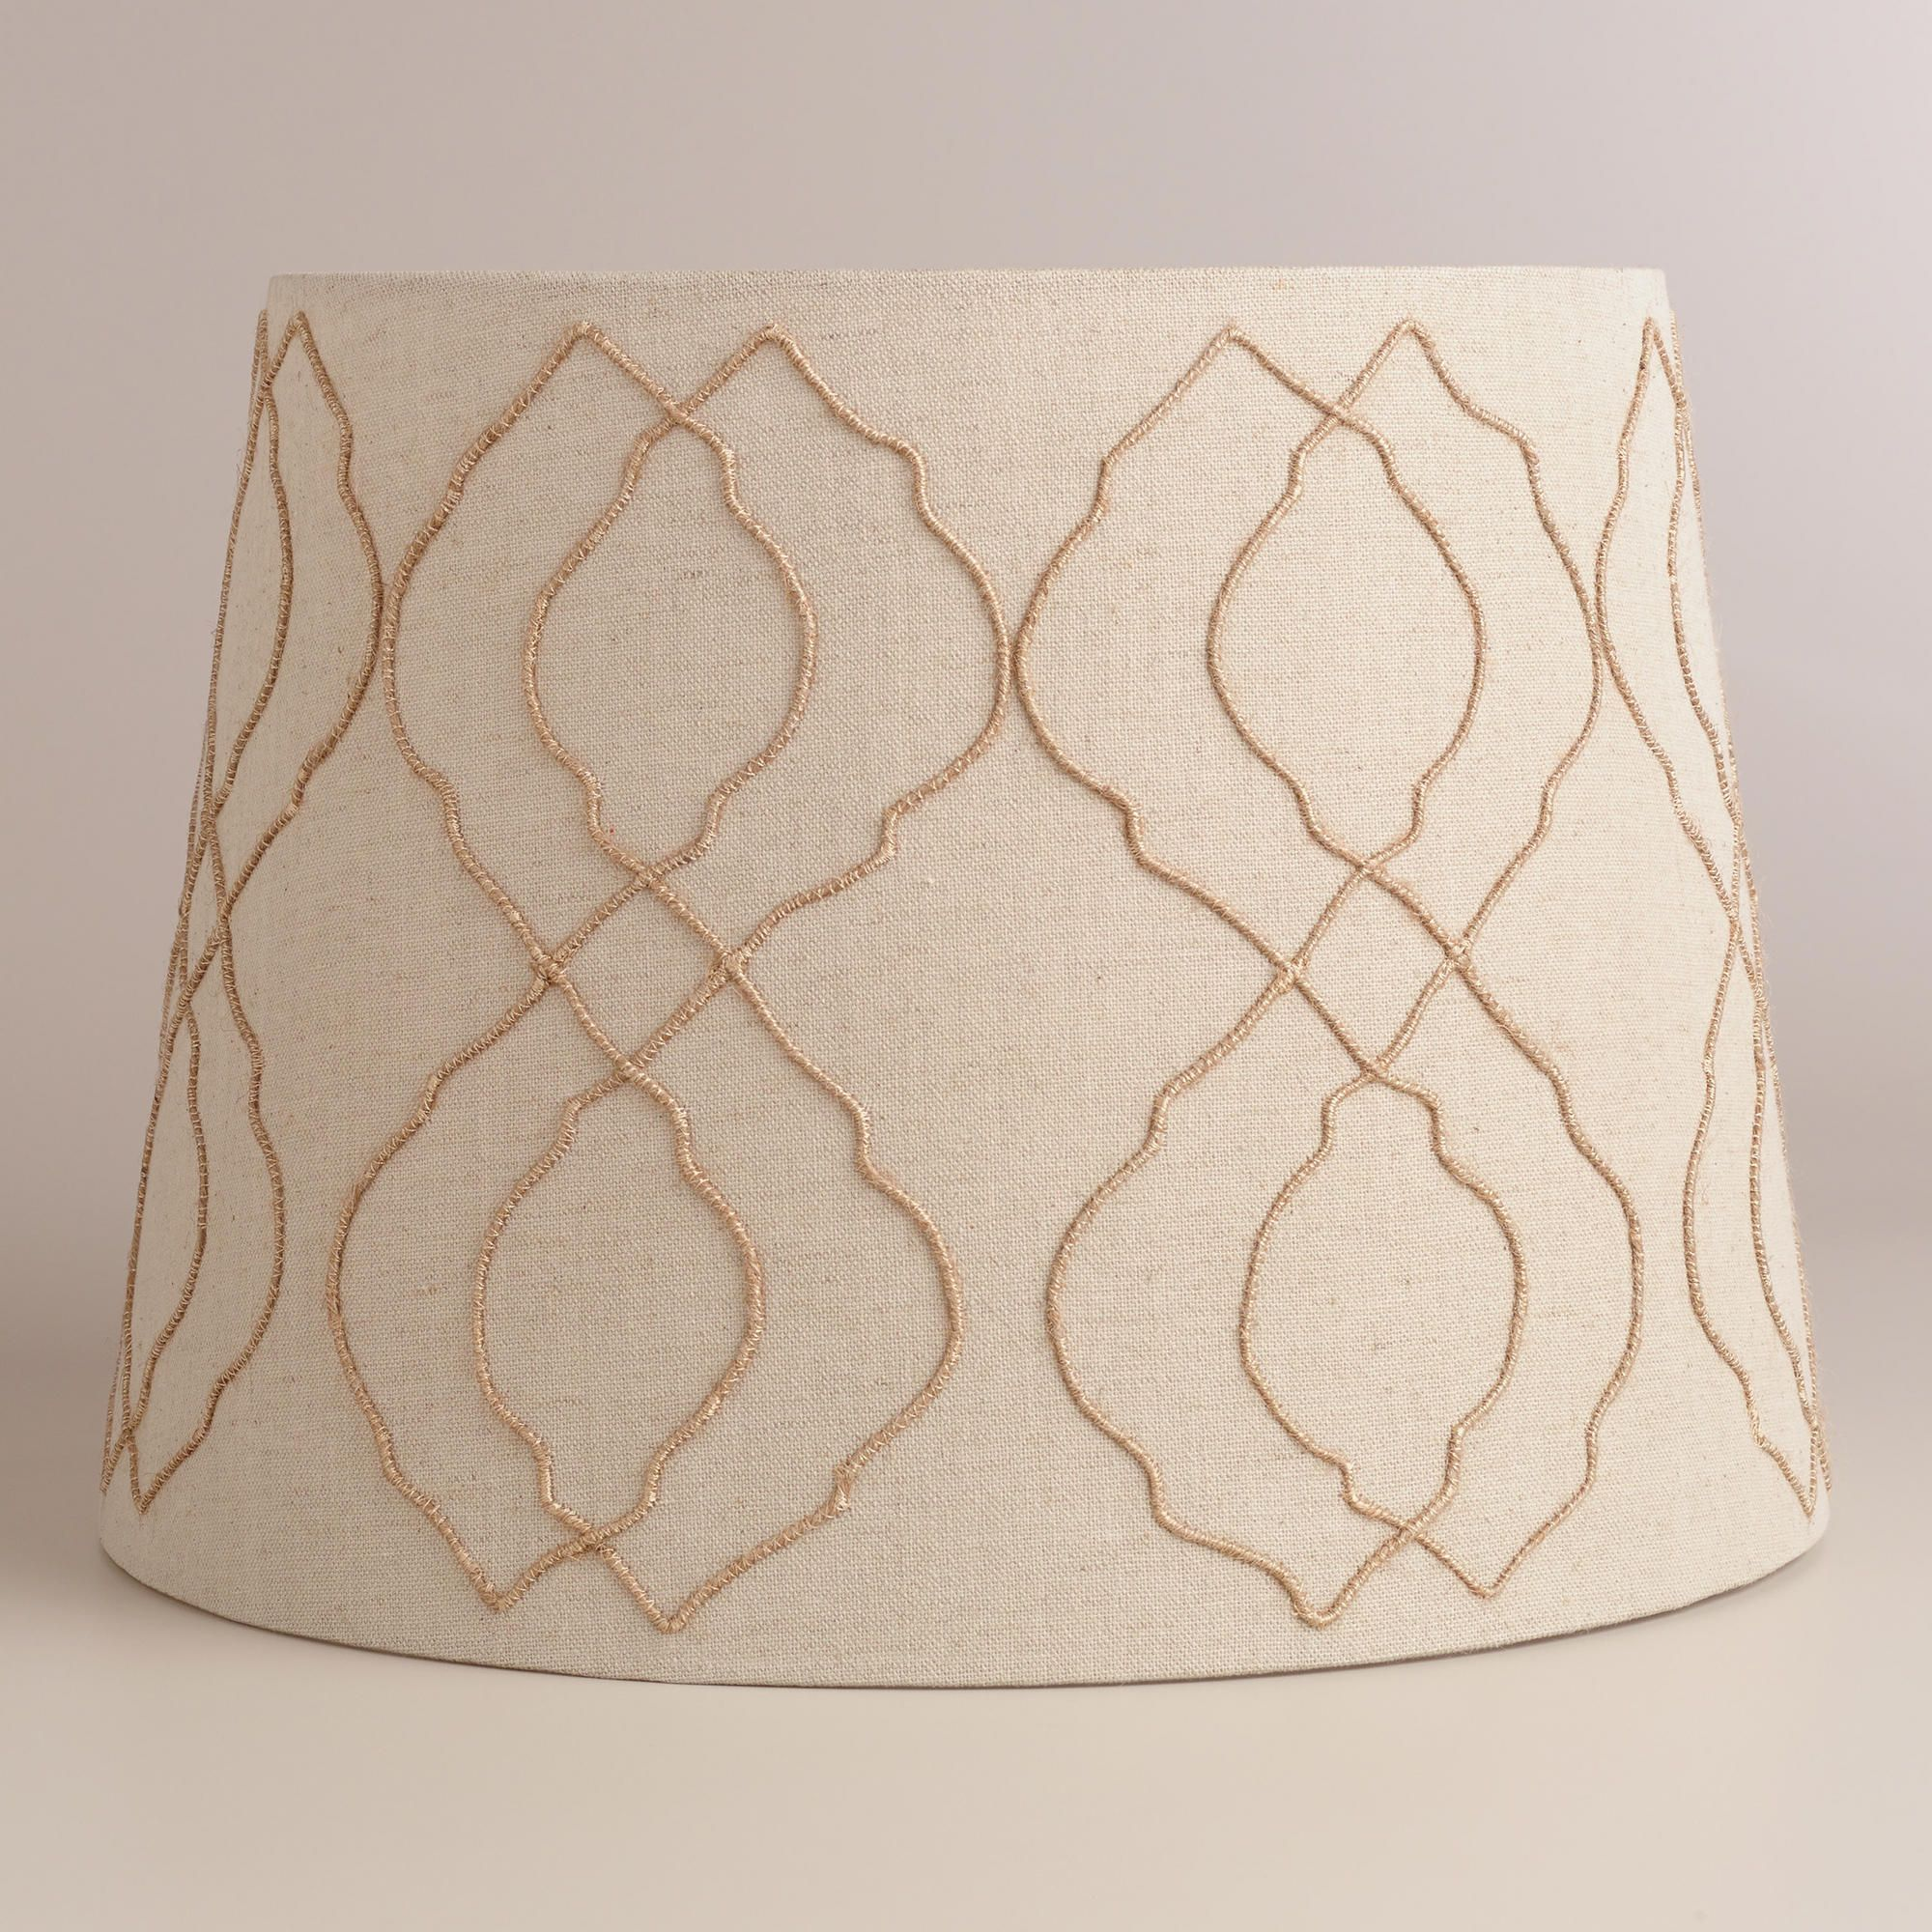 World Market Lamp Shades Jute Tile Table Lamp Shade  World Market $2999  House Lighting